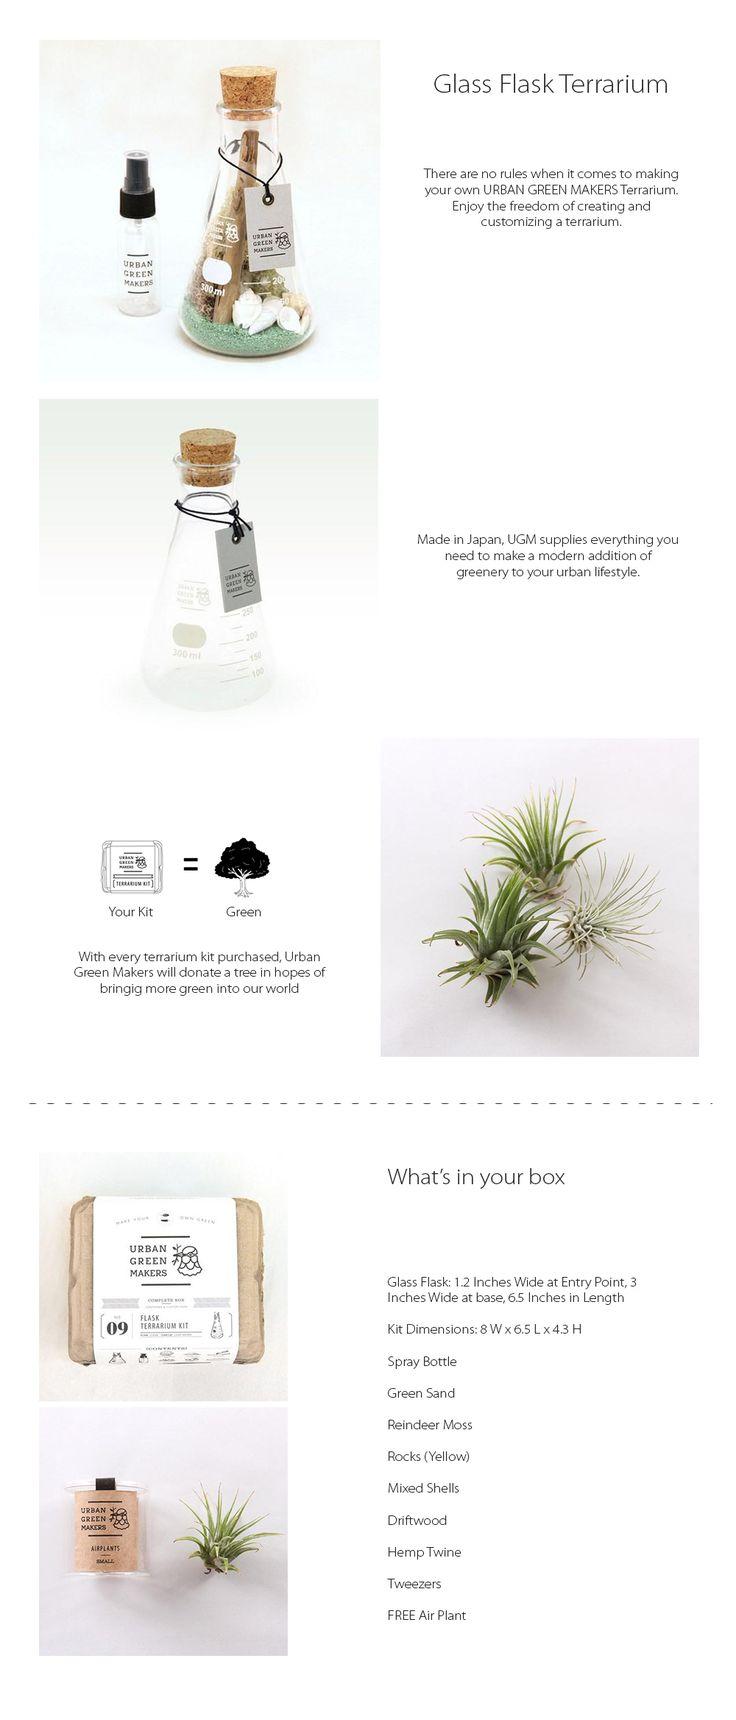 DIY Glass Flask Terrarium Make Your Own Terrarium